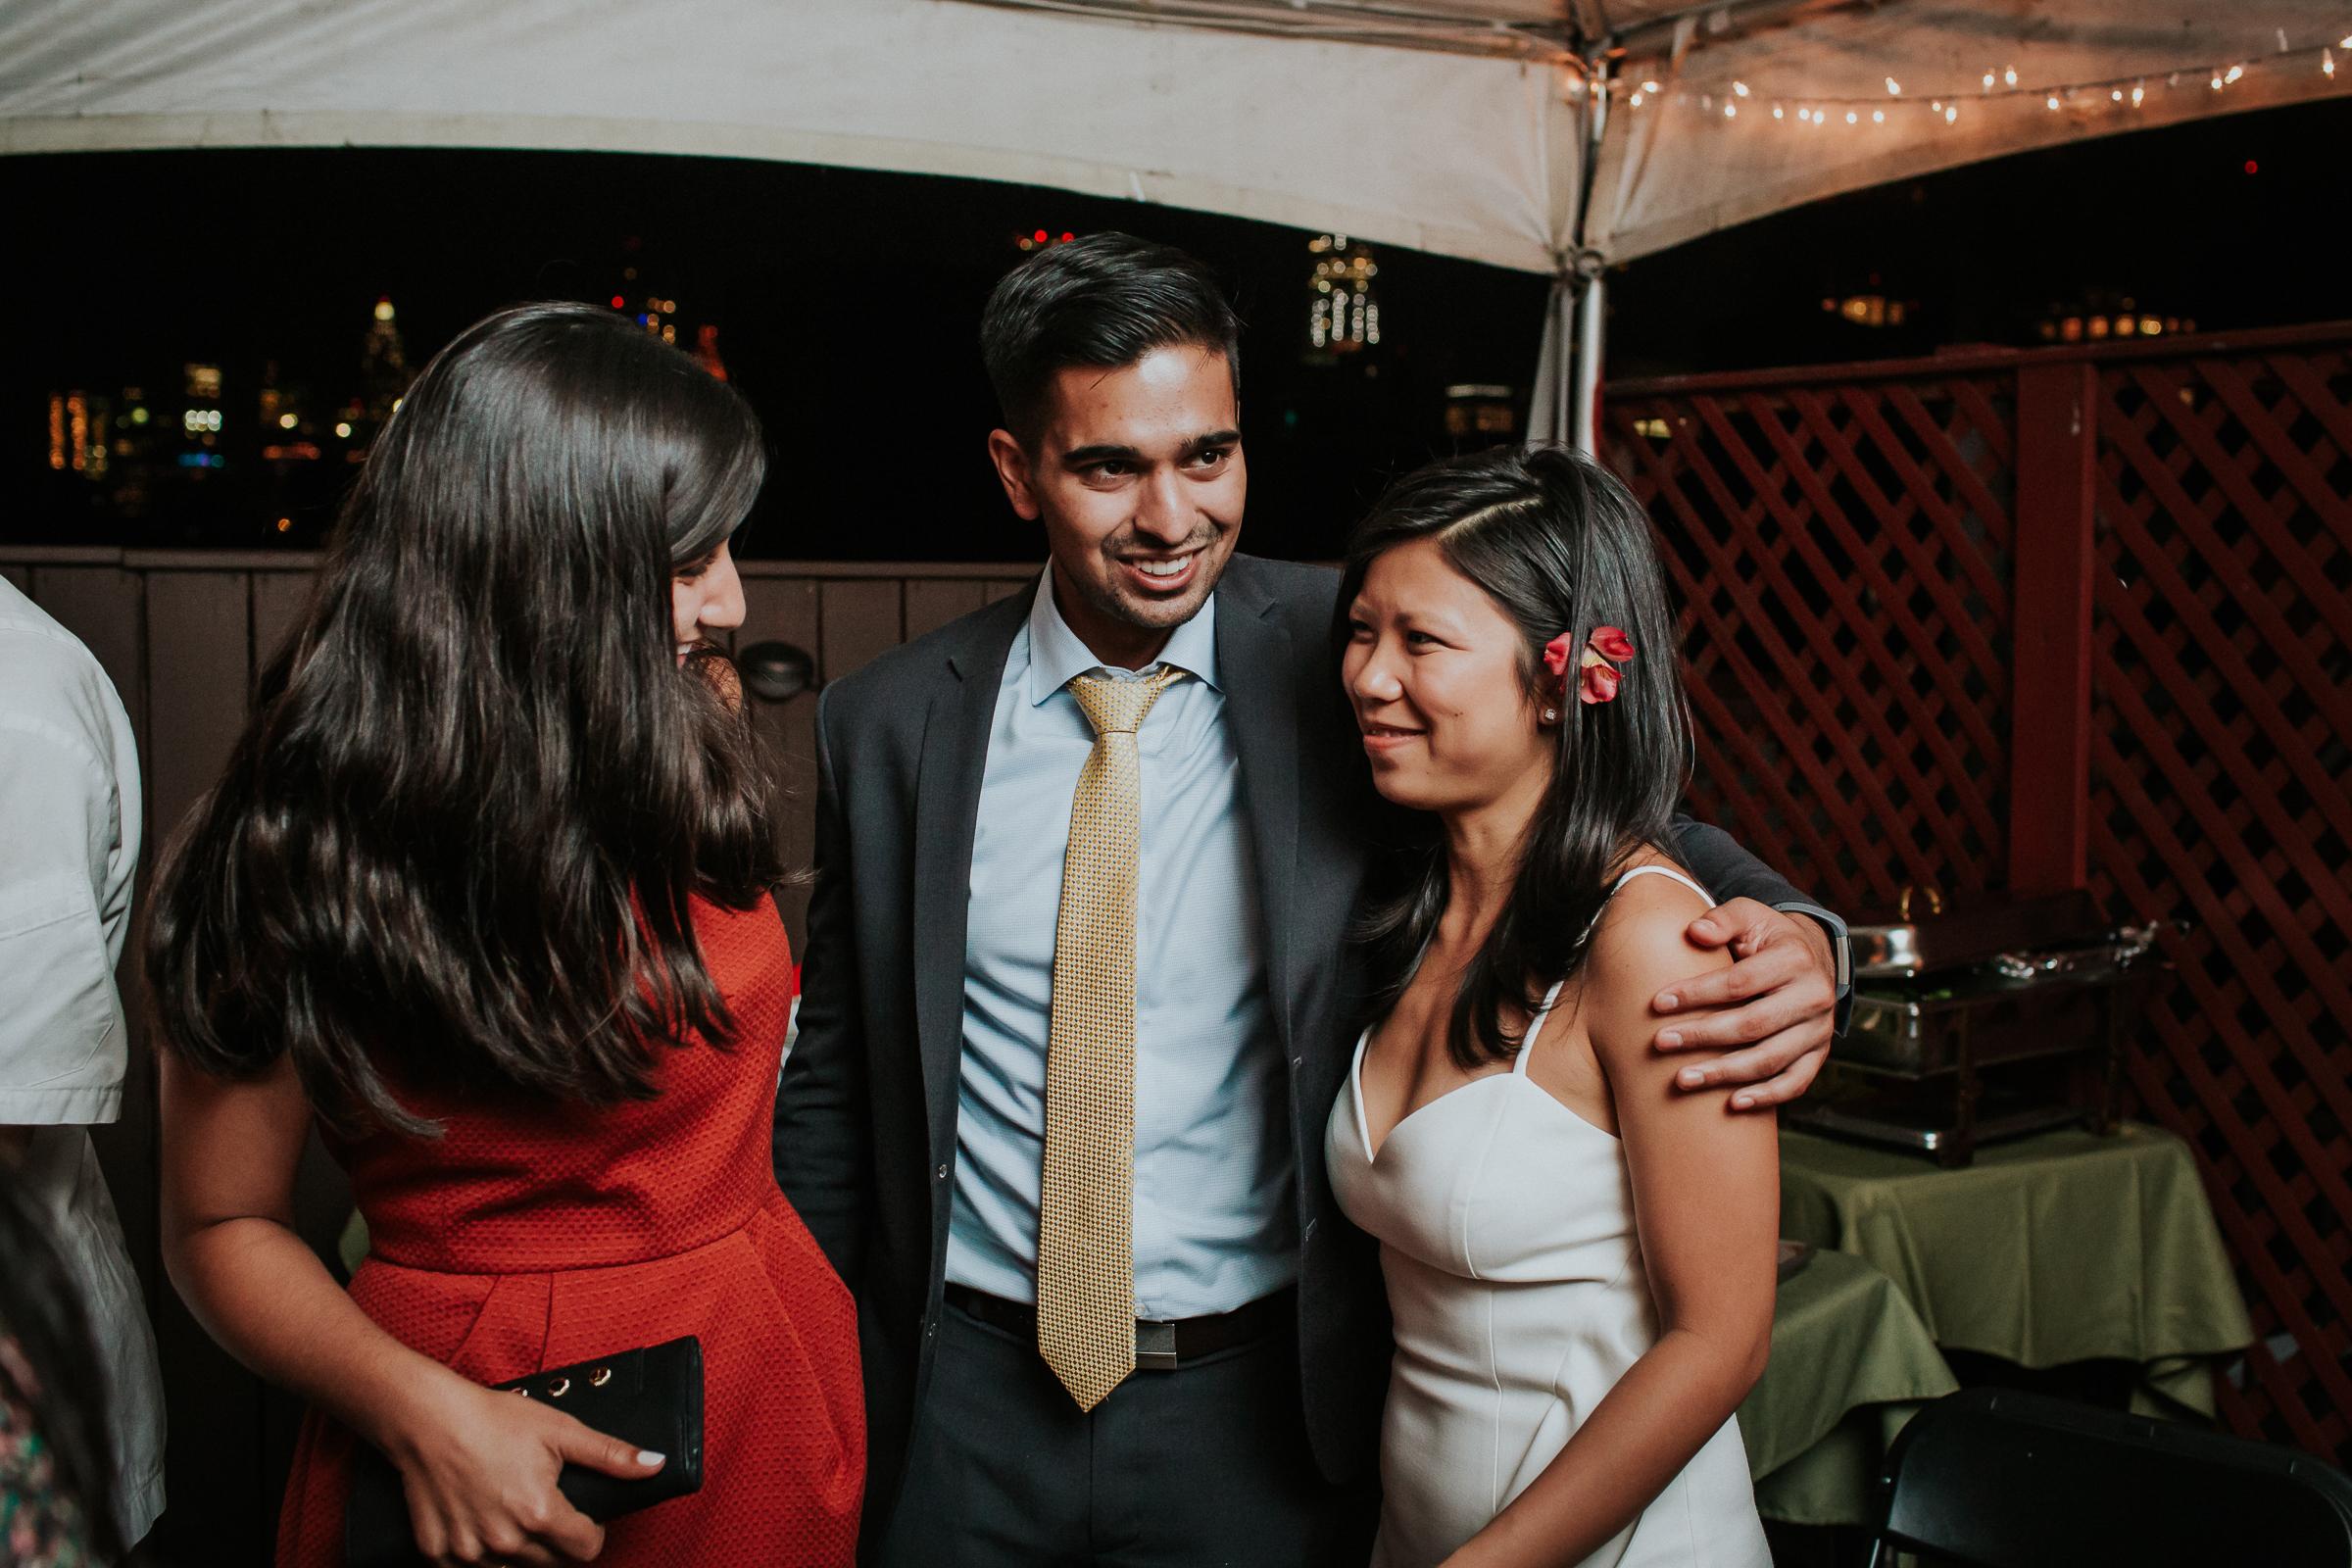 The-Bhakti-Center-Yoga-NYC-Rooftop-Documentary-Wedding-Photographer-69.jpg